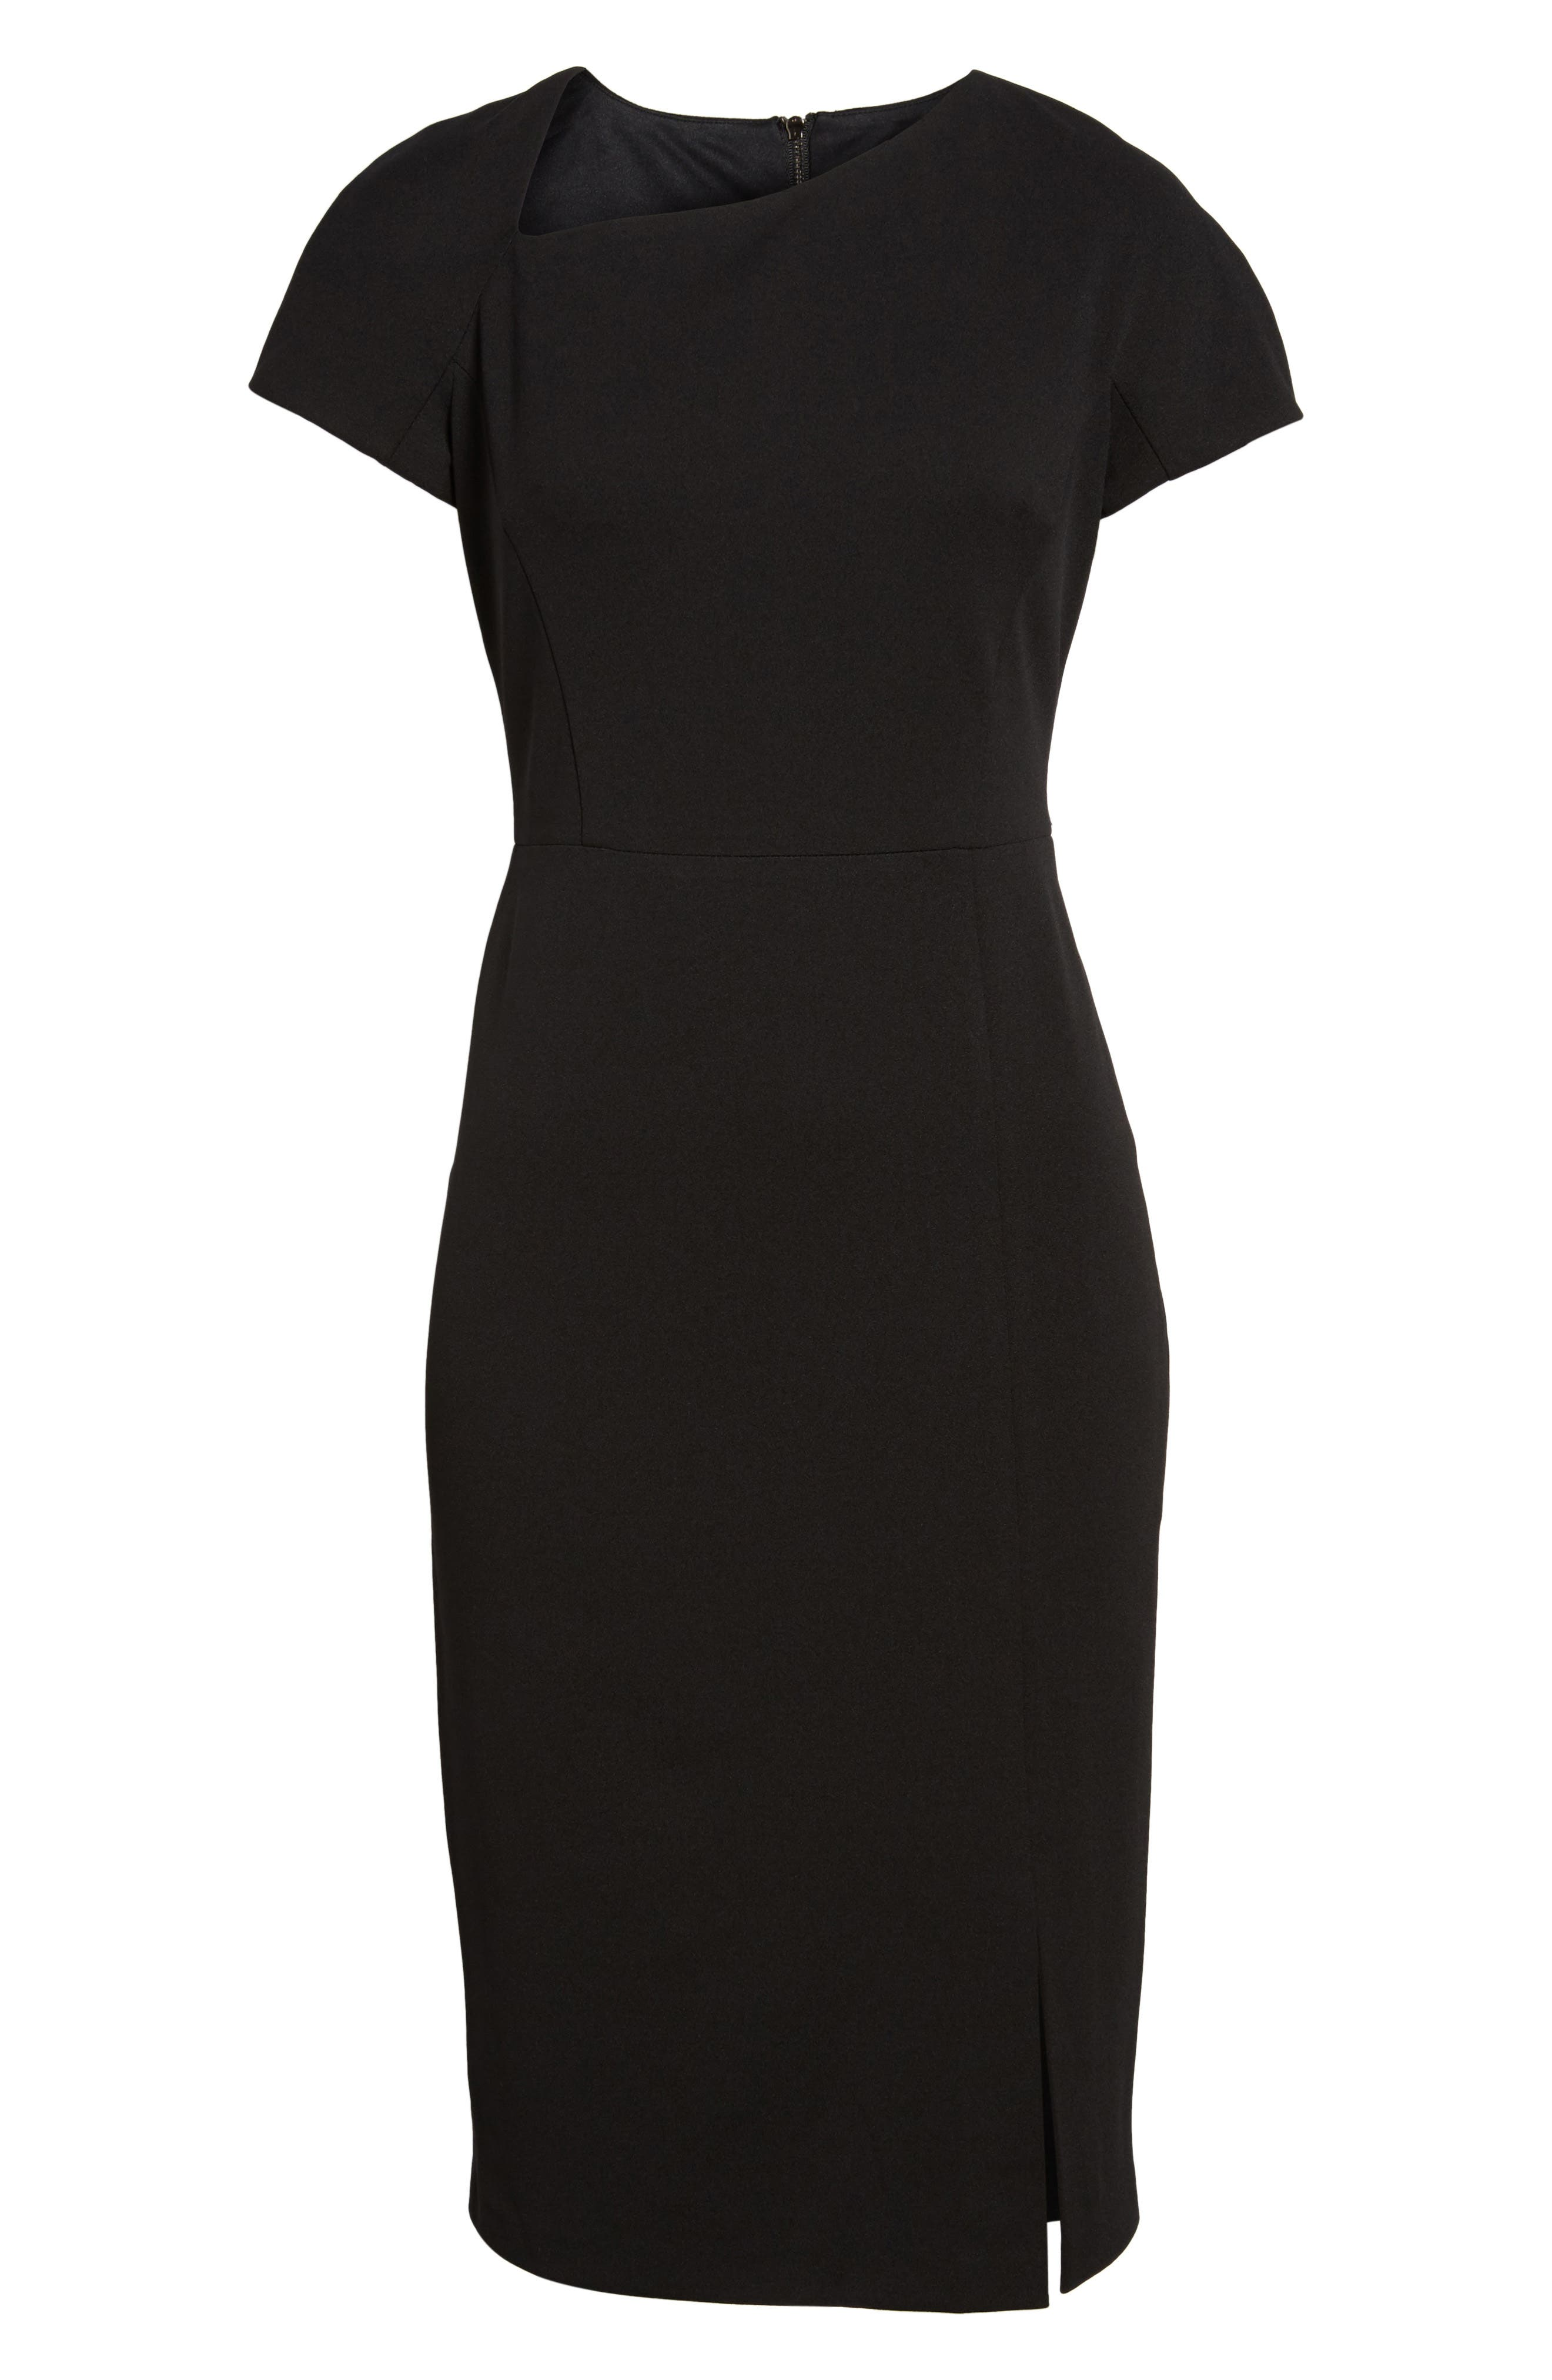 MAGGY LONDON, Asymmetrical Sheath Dress, Alternate thumbnail 6, color, 001